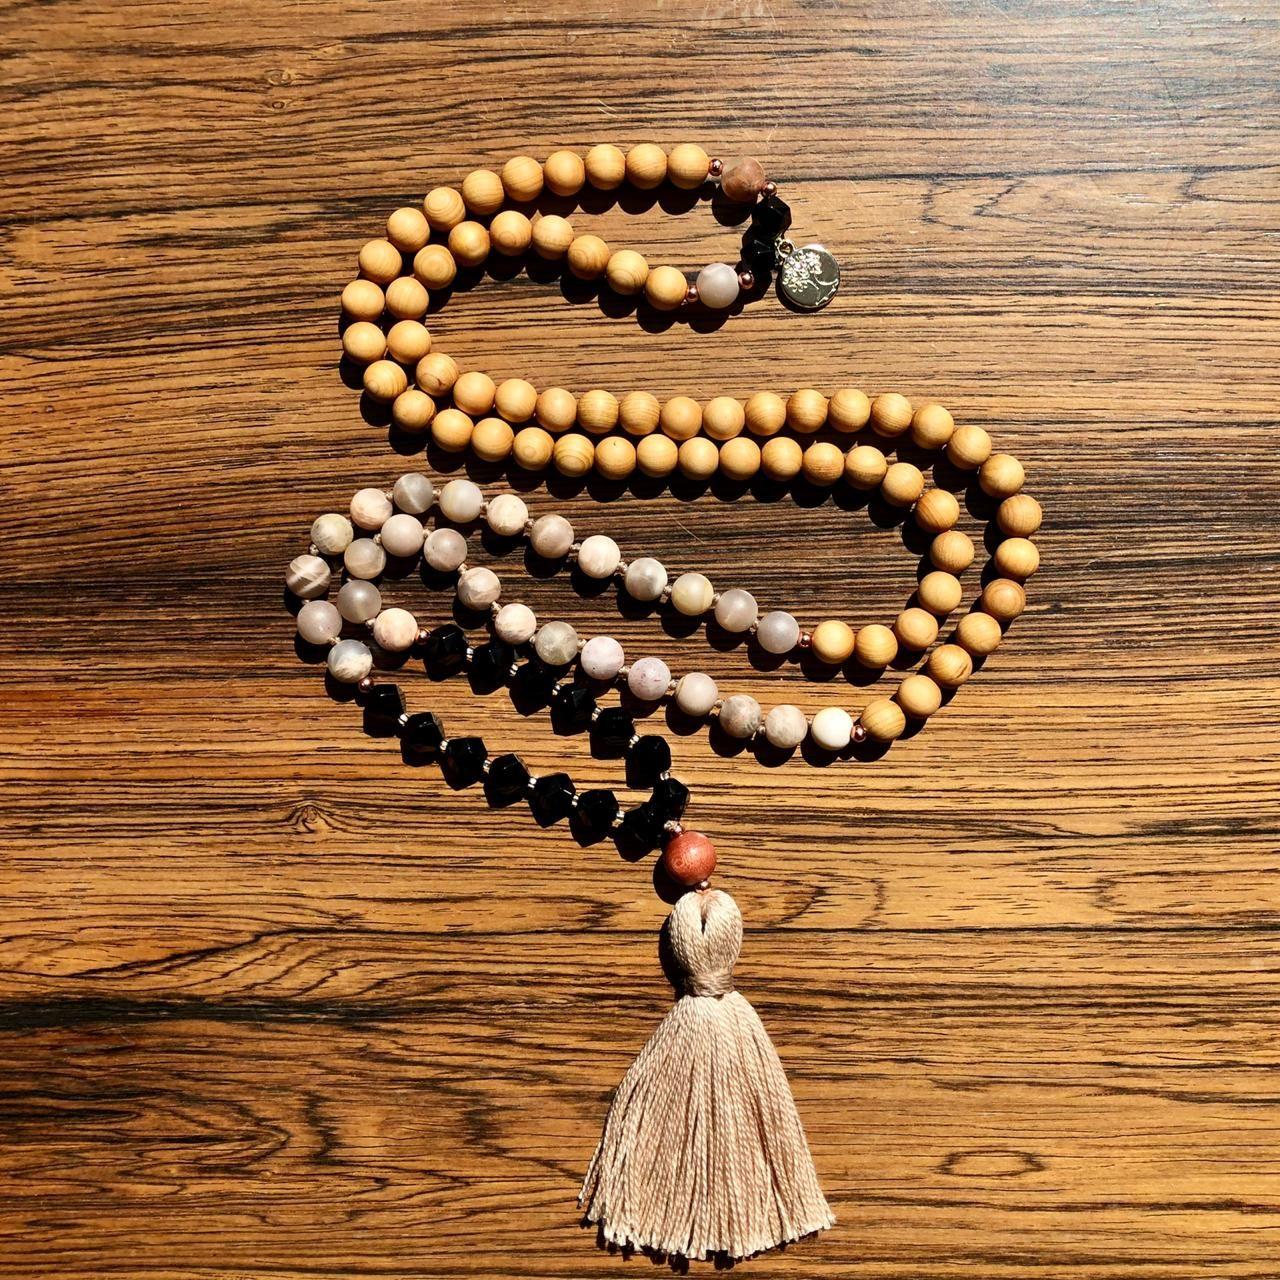 Mala 108 Beaded Necklace Druzy Gold 8mm Agate Moonstone Mala Necklace